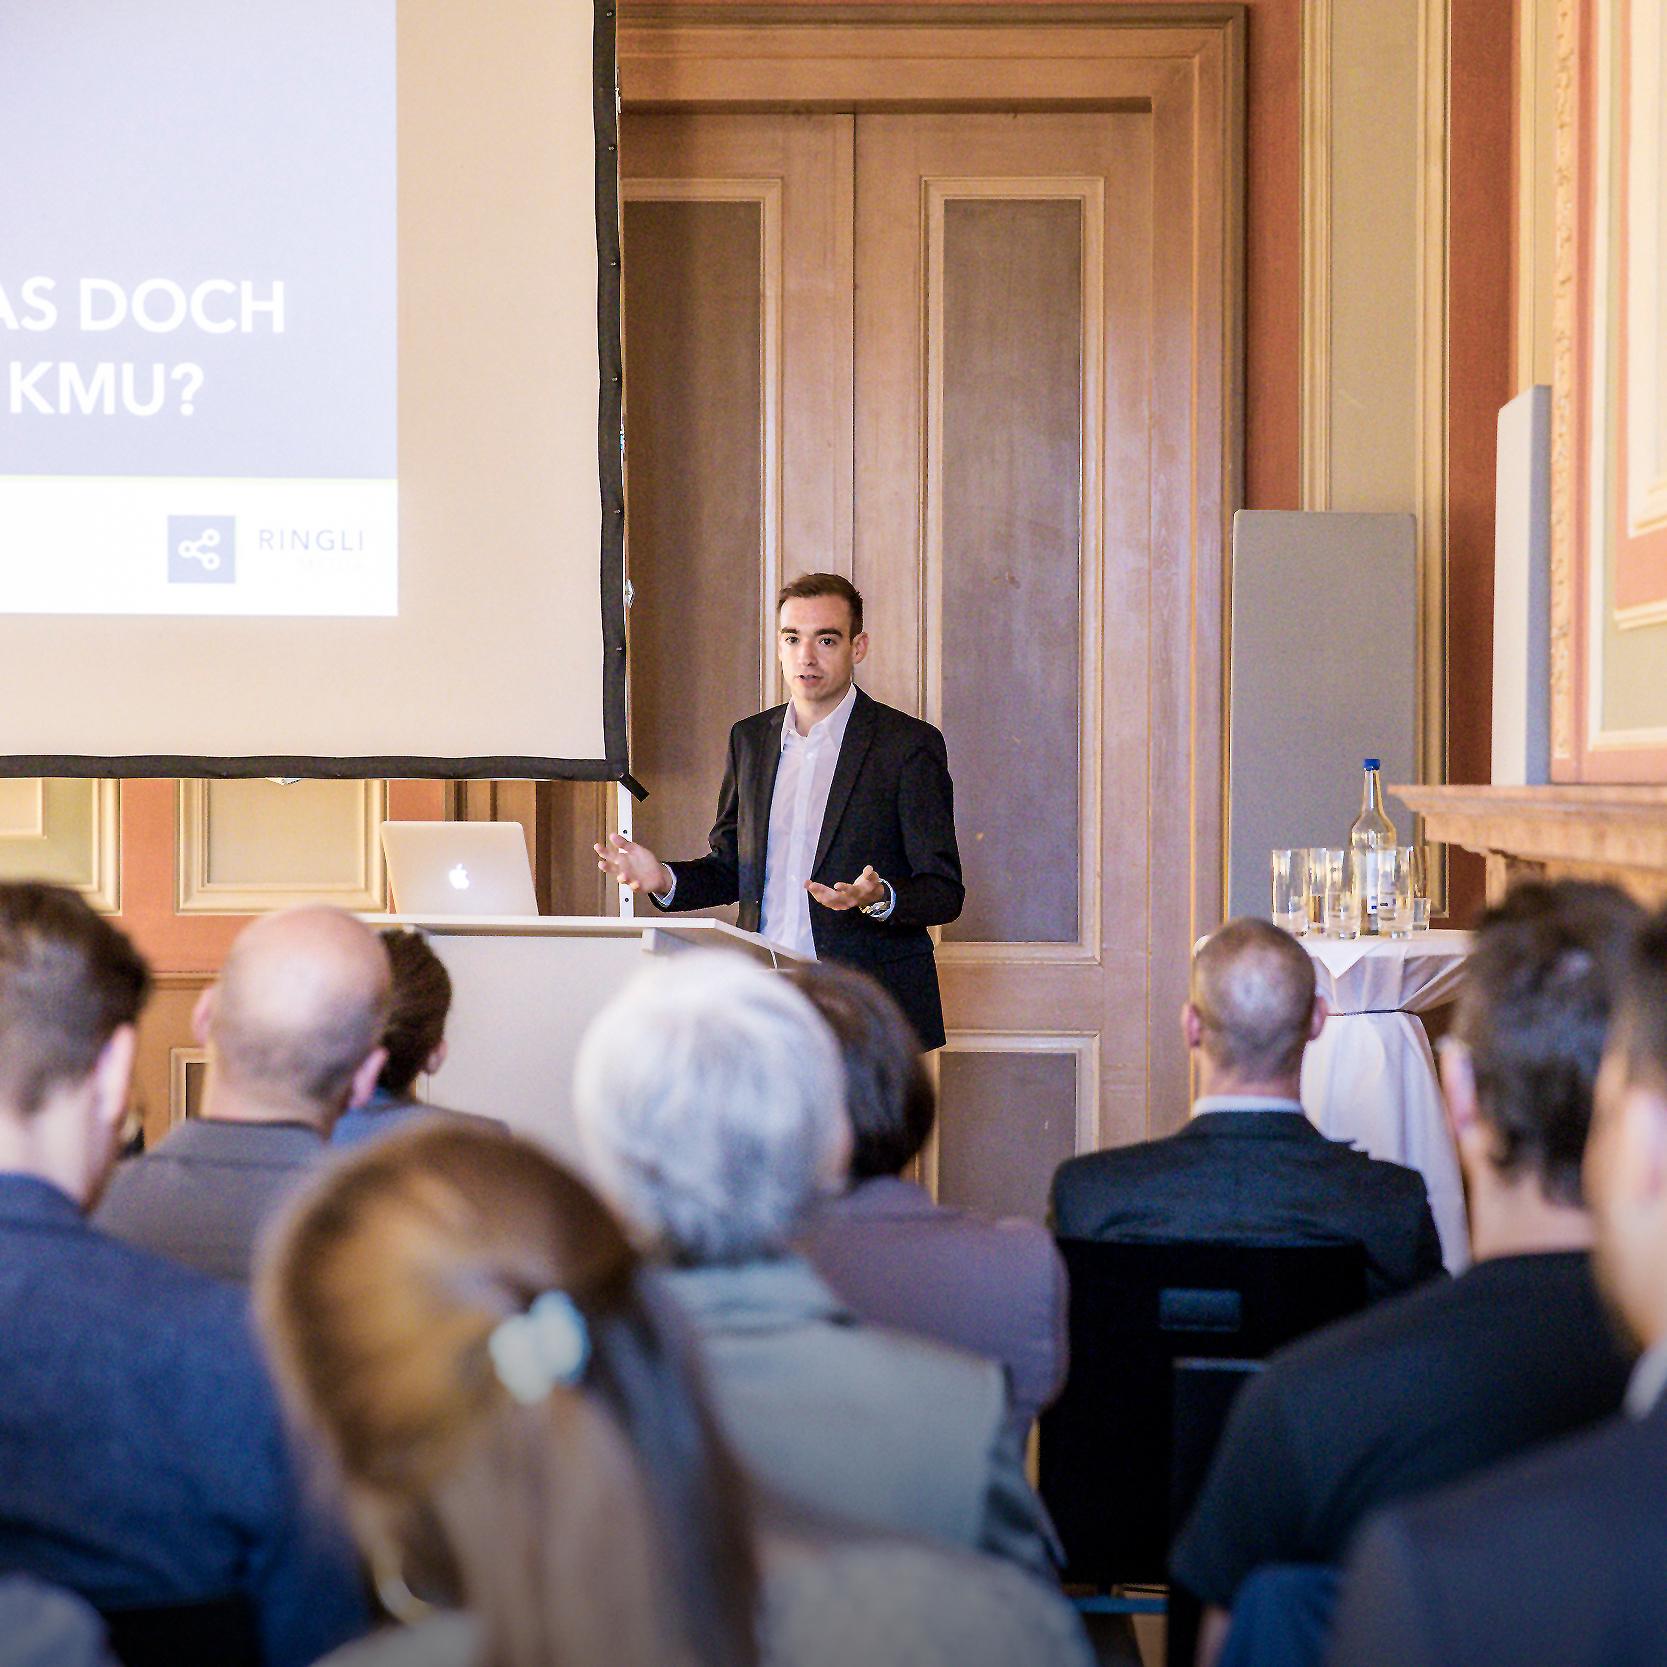 Rückblick: RINGLI.media Business Brunch Vortrag bei ICT Schaffhausen